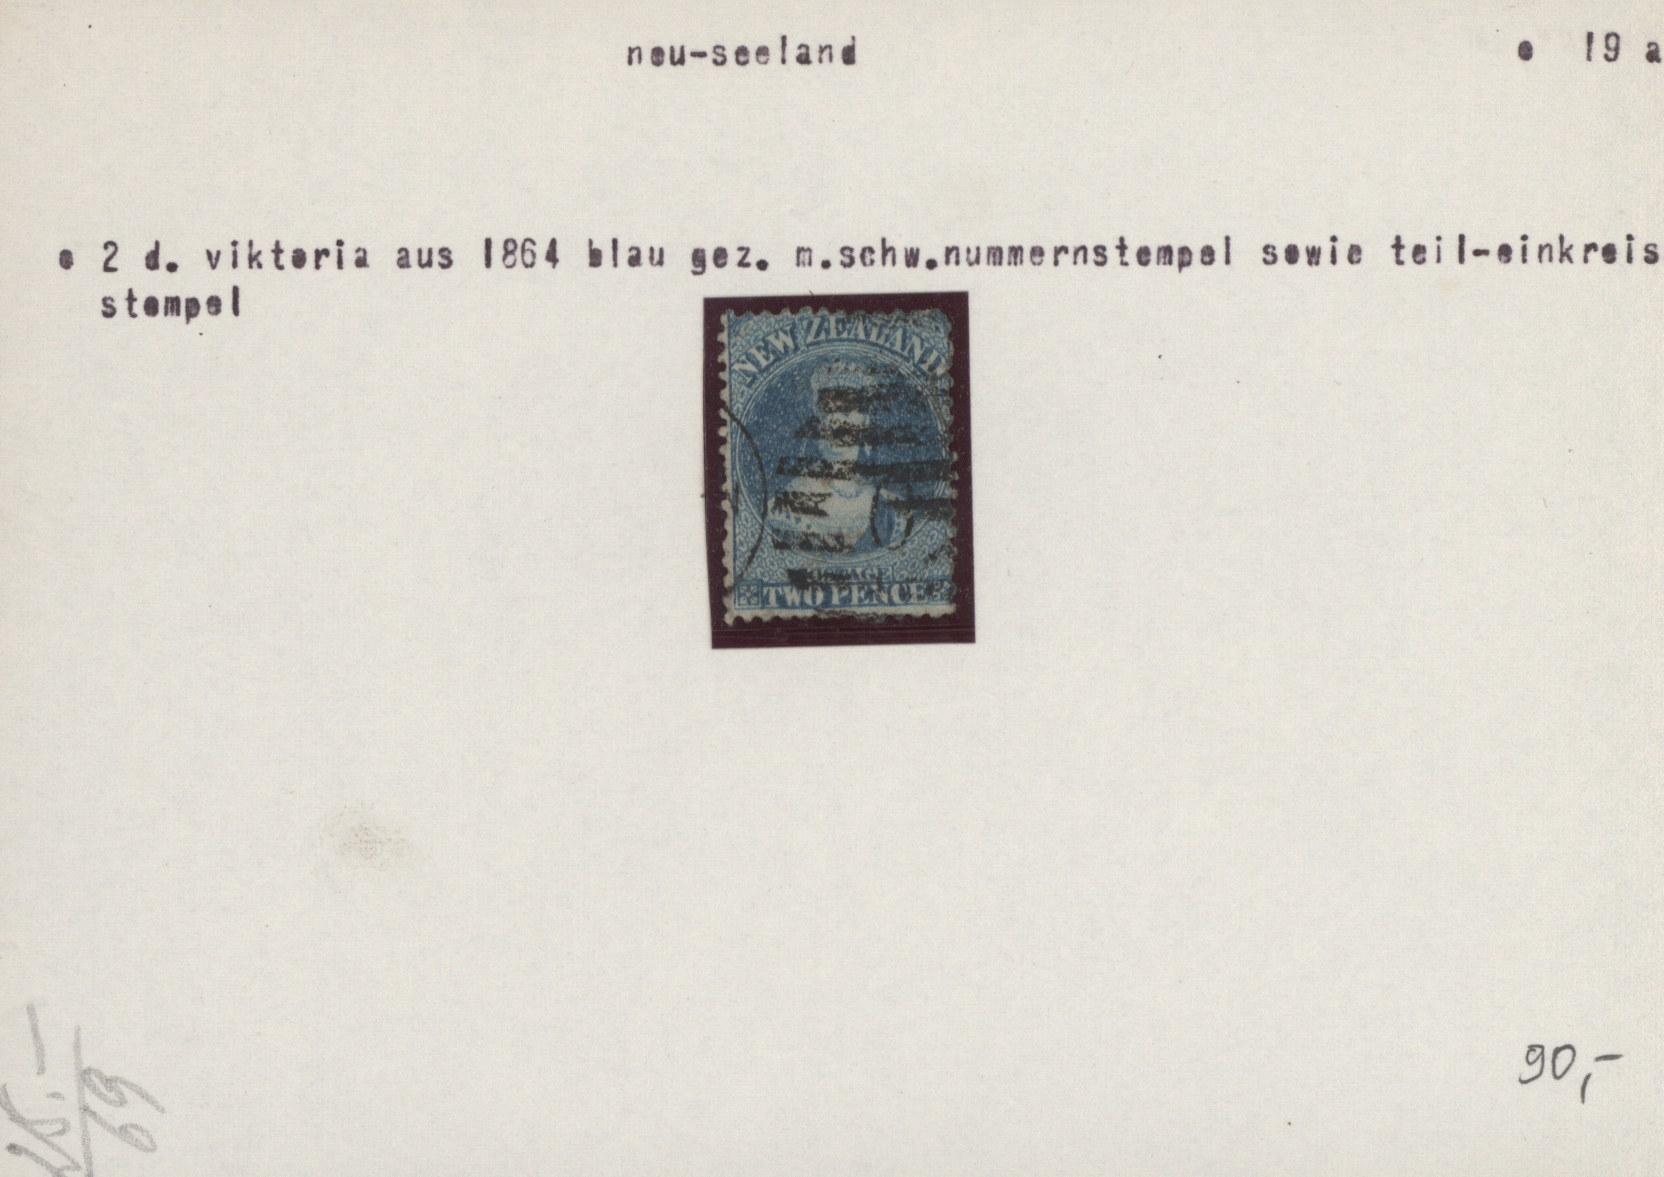 Lot 26110 - nachlässe  -  Auktionshaus Christoph Gärtner GmbH & Co. KG Sale #46 Gollcetions Germany - including the suplement